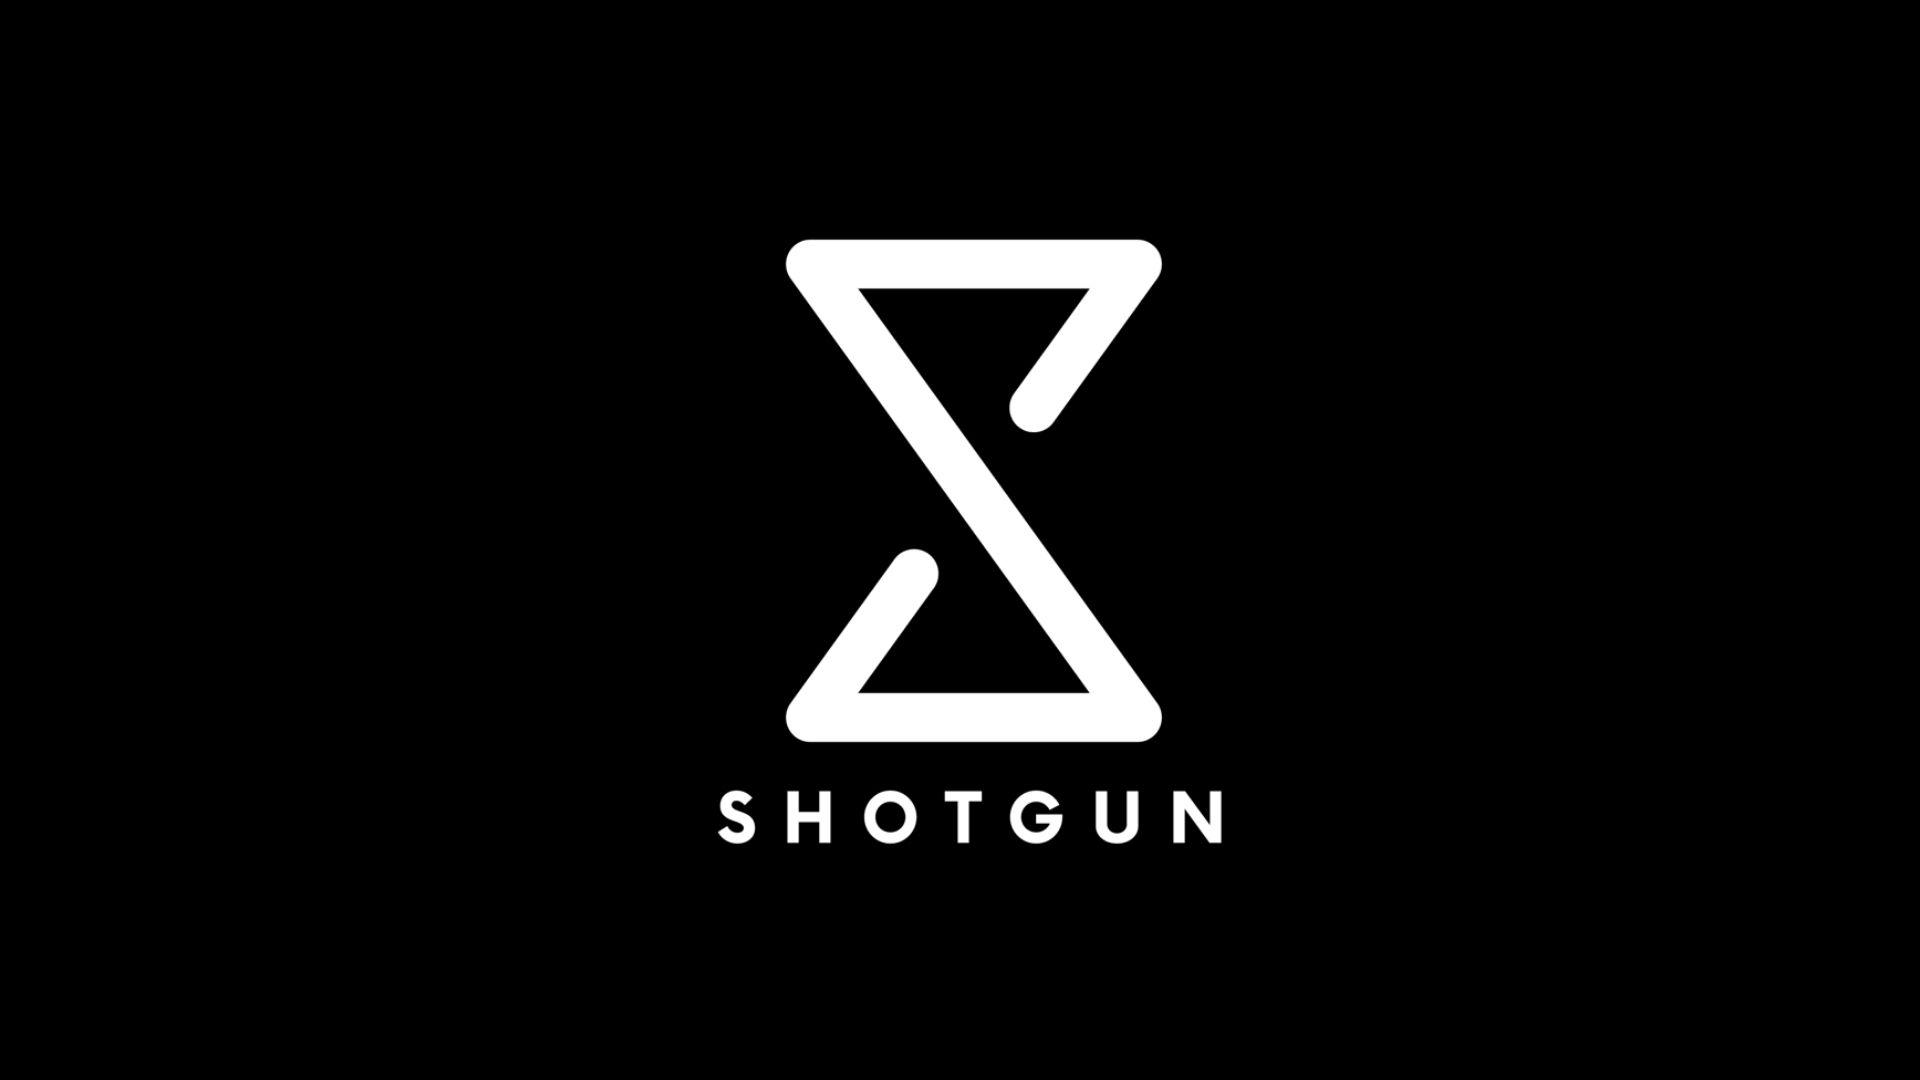 Shotgun lève deux millions d'euros